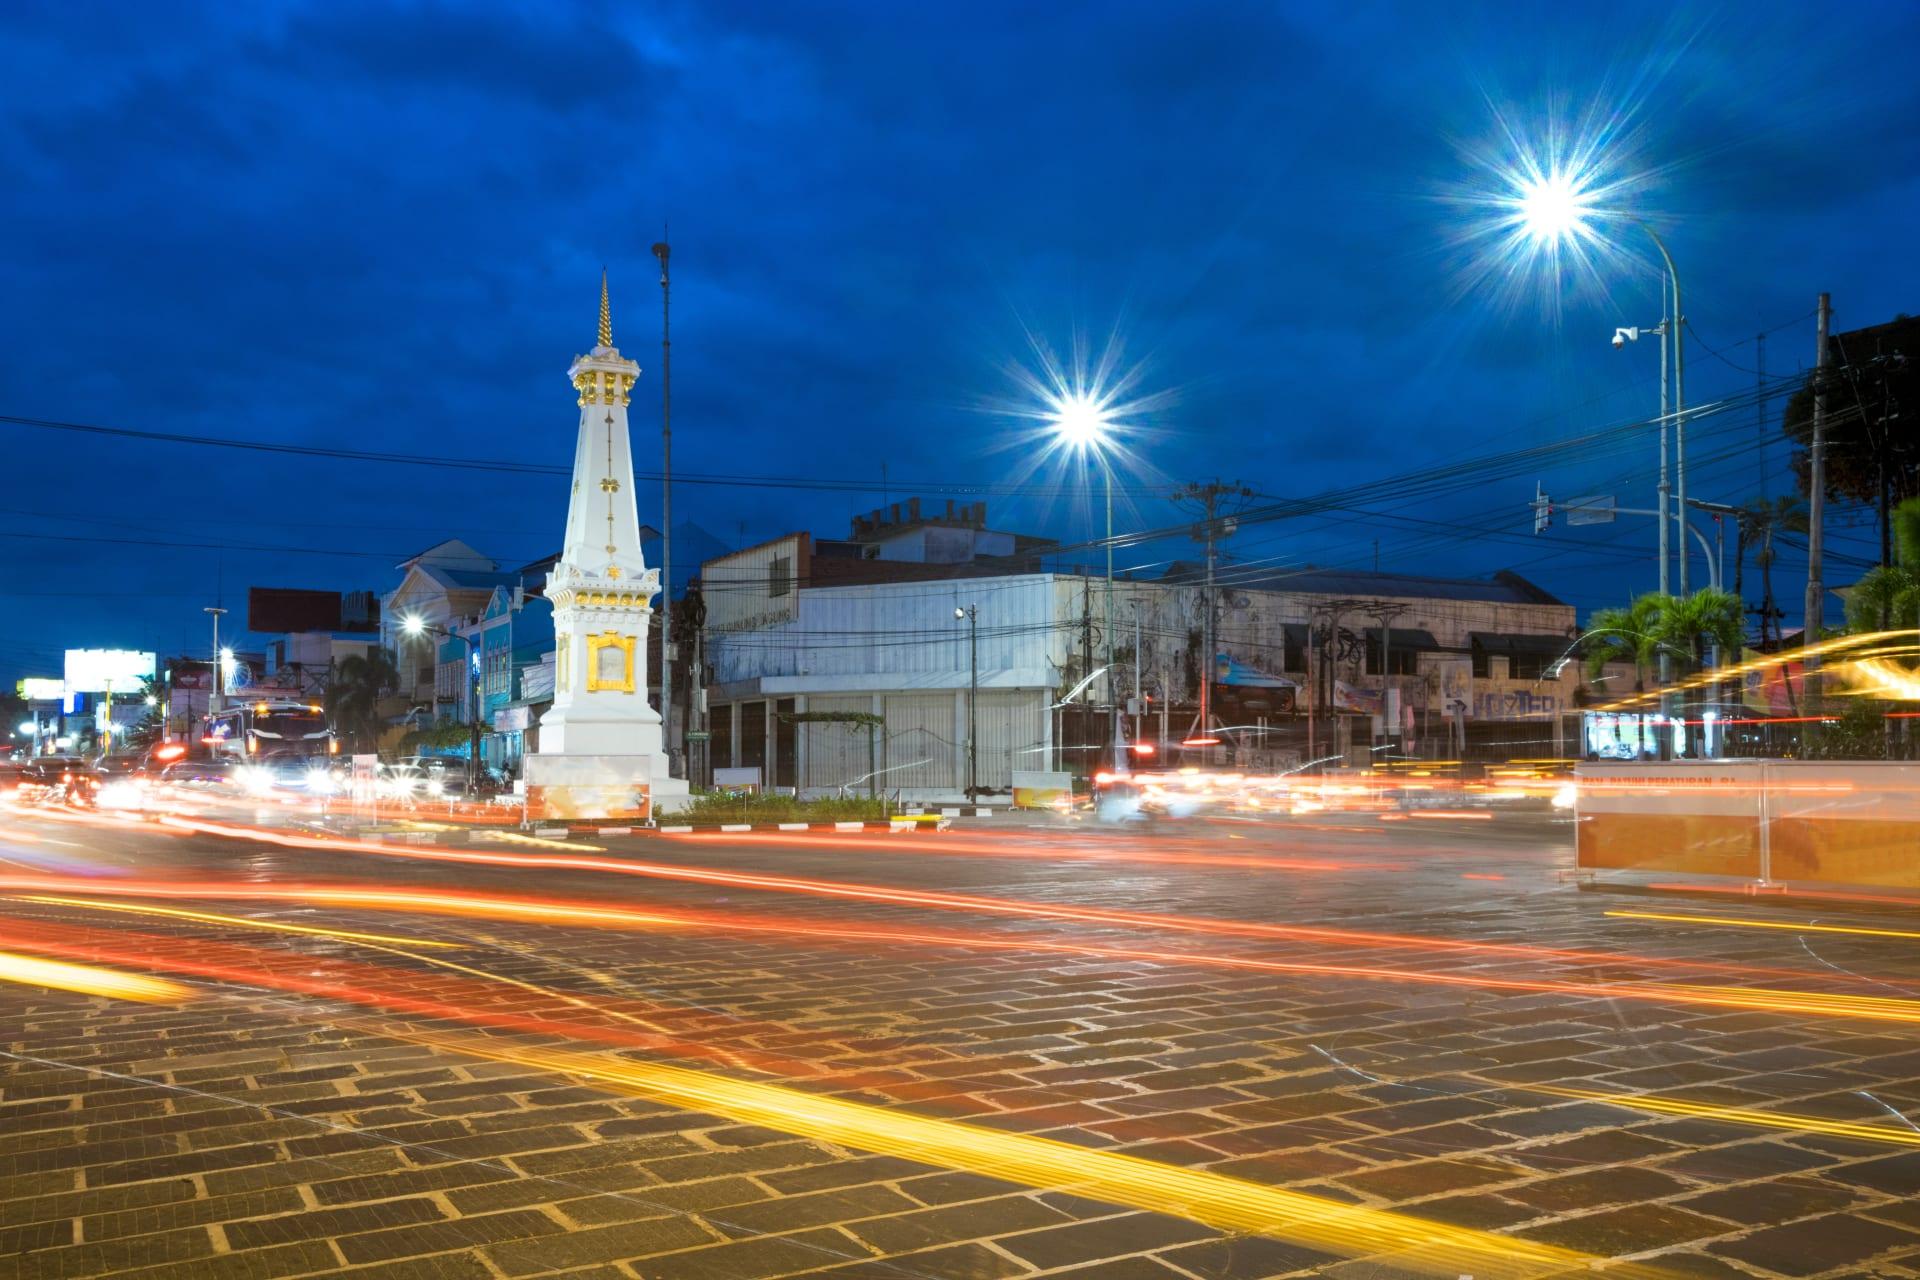 Yogyakarta - City of Yogyakarta and its Philosophical Axis, part 2